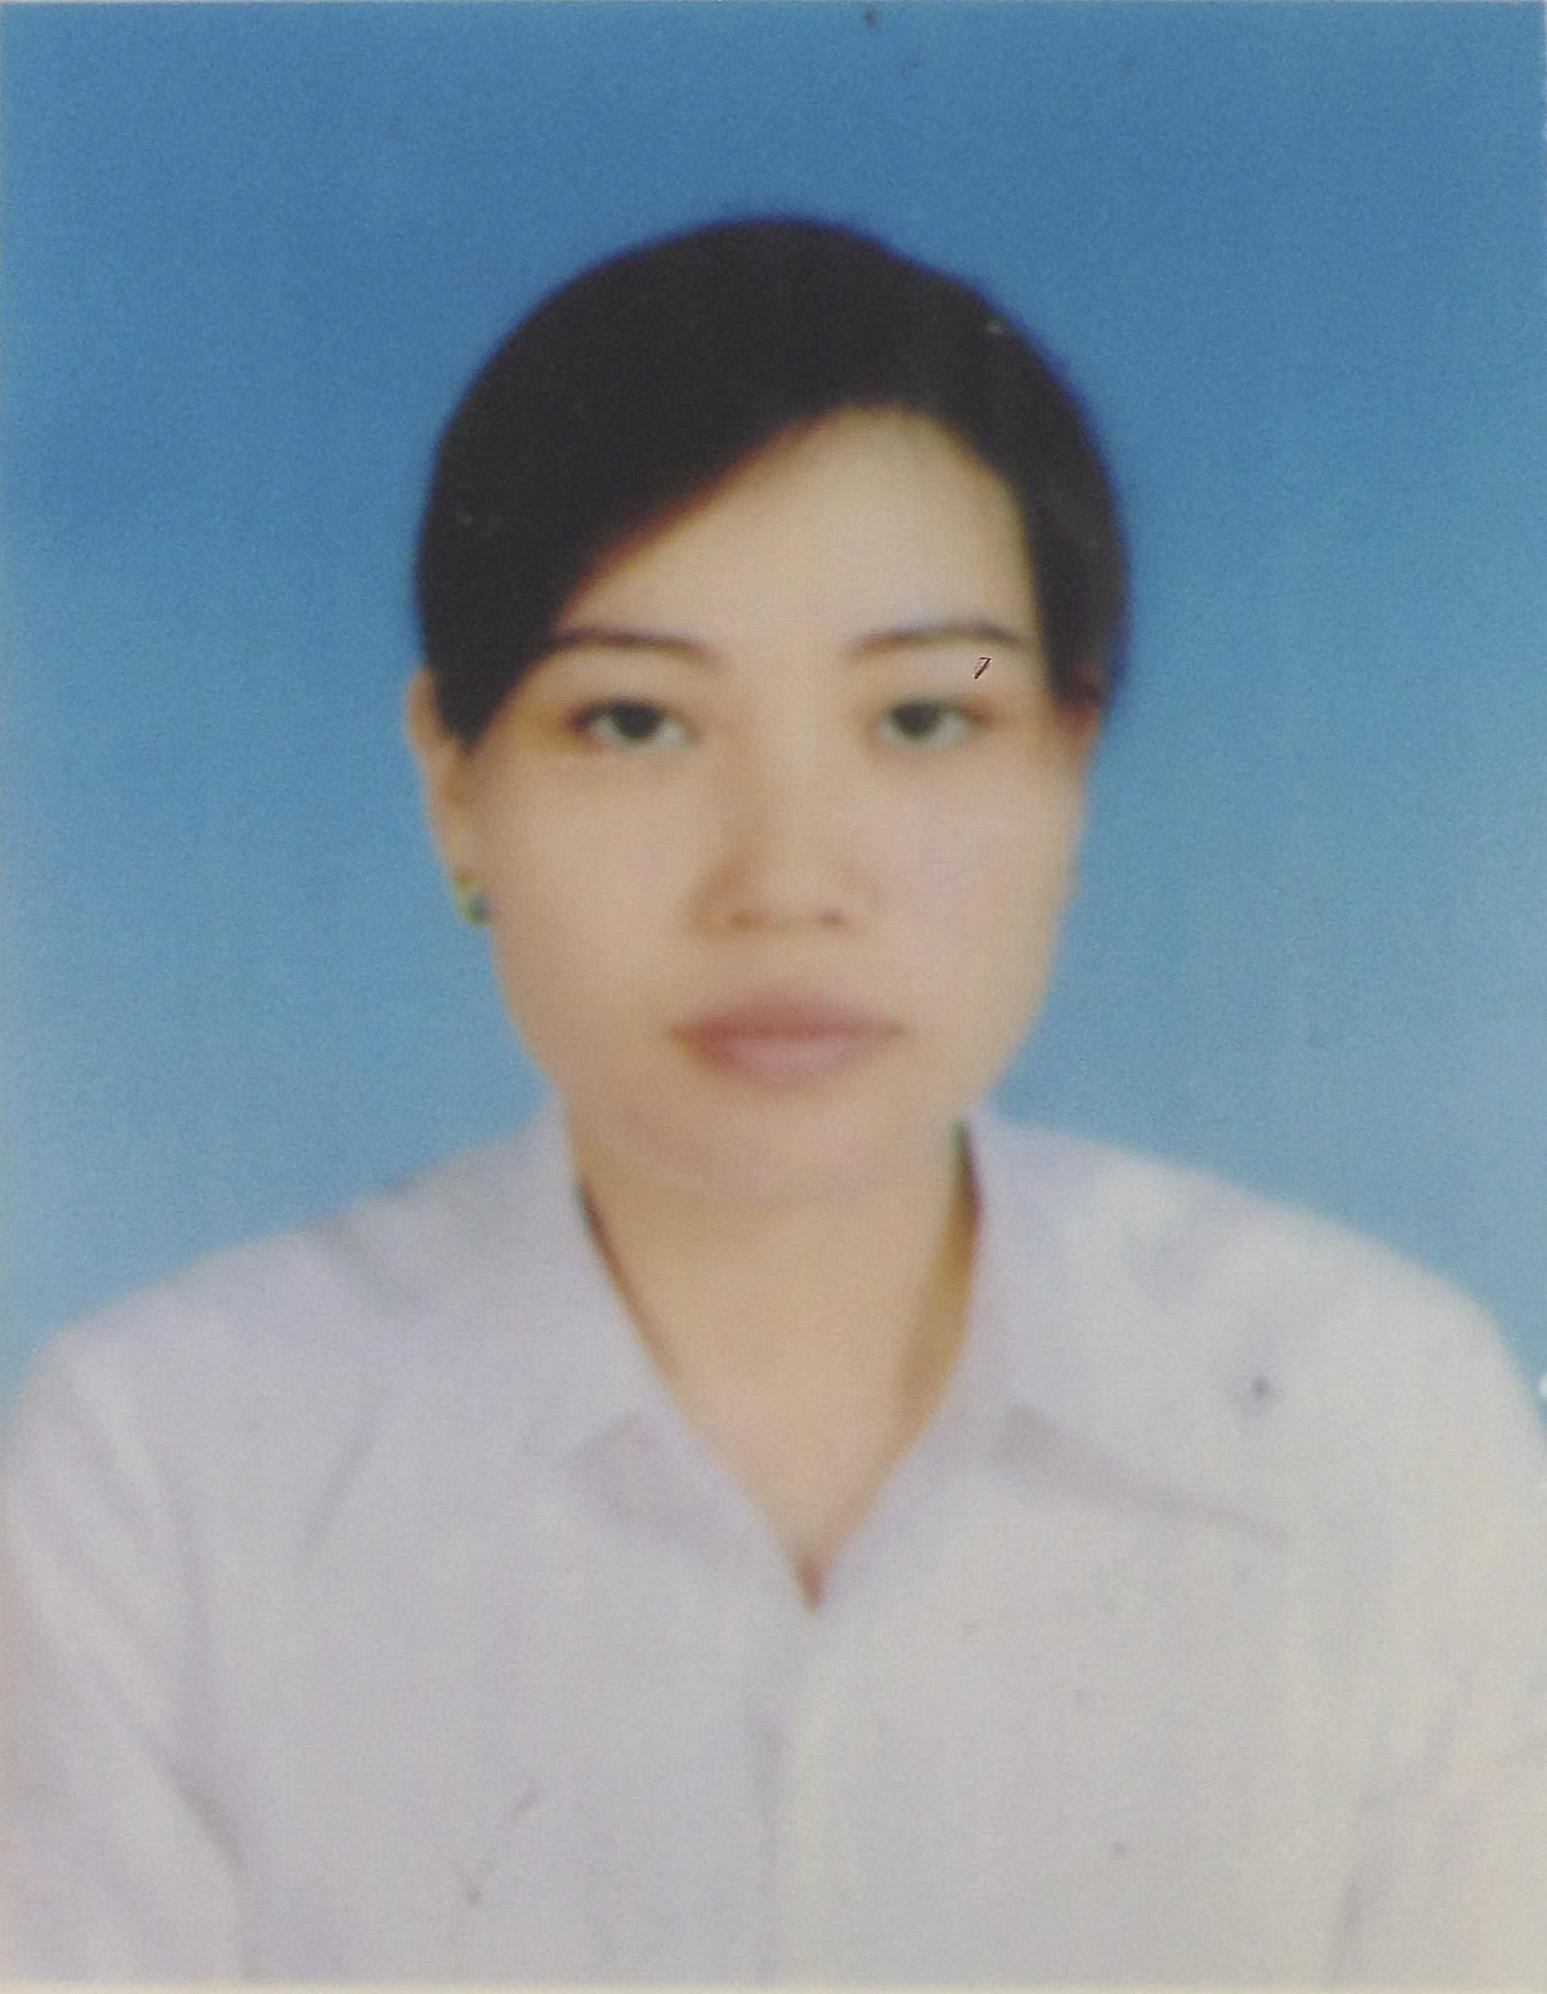 Nguyễn Hoa Hương